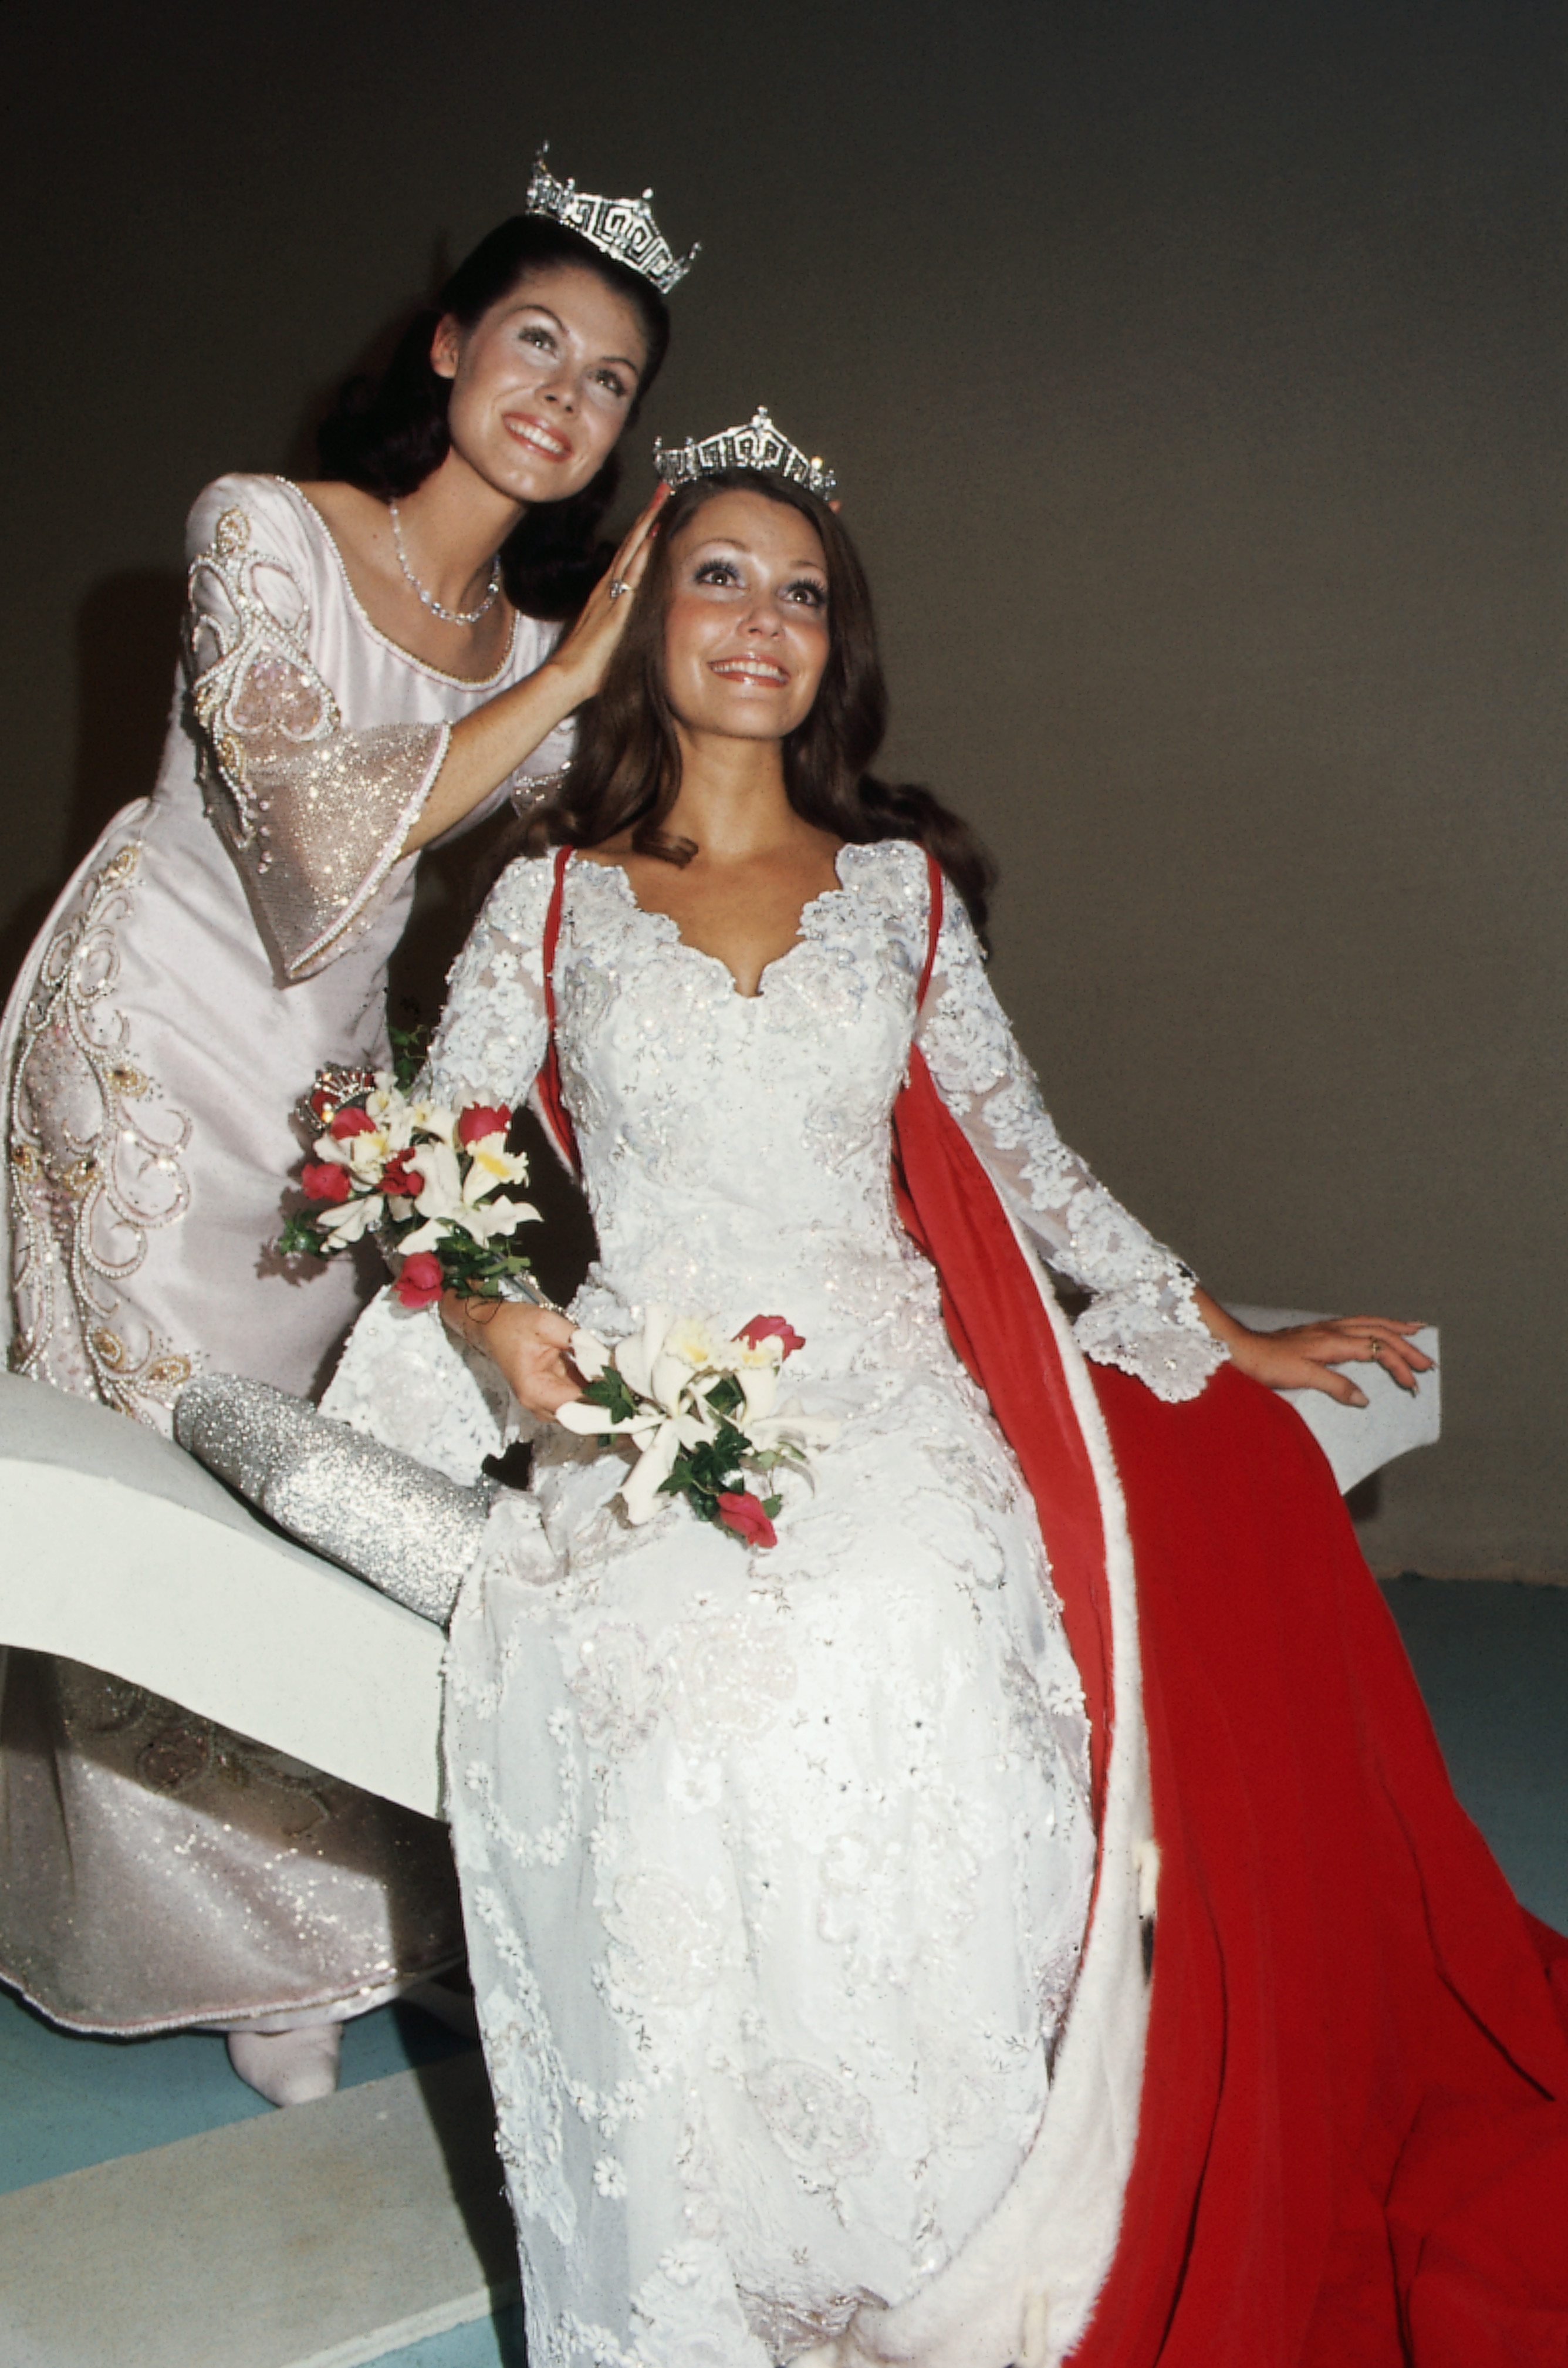 1973: Terry Anne Meeuwsen from De Pere, Wis.